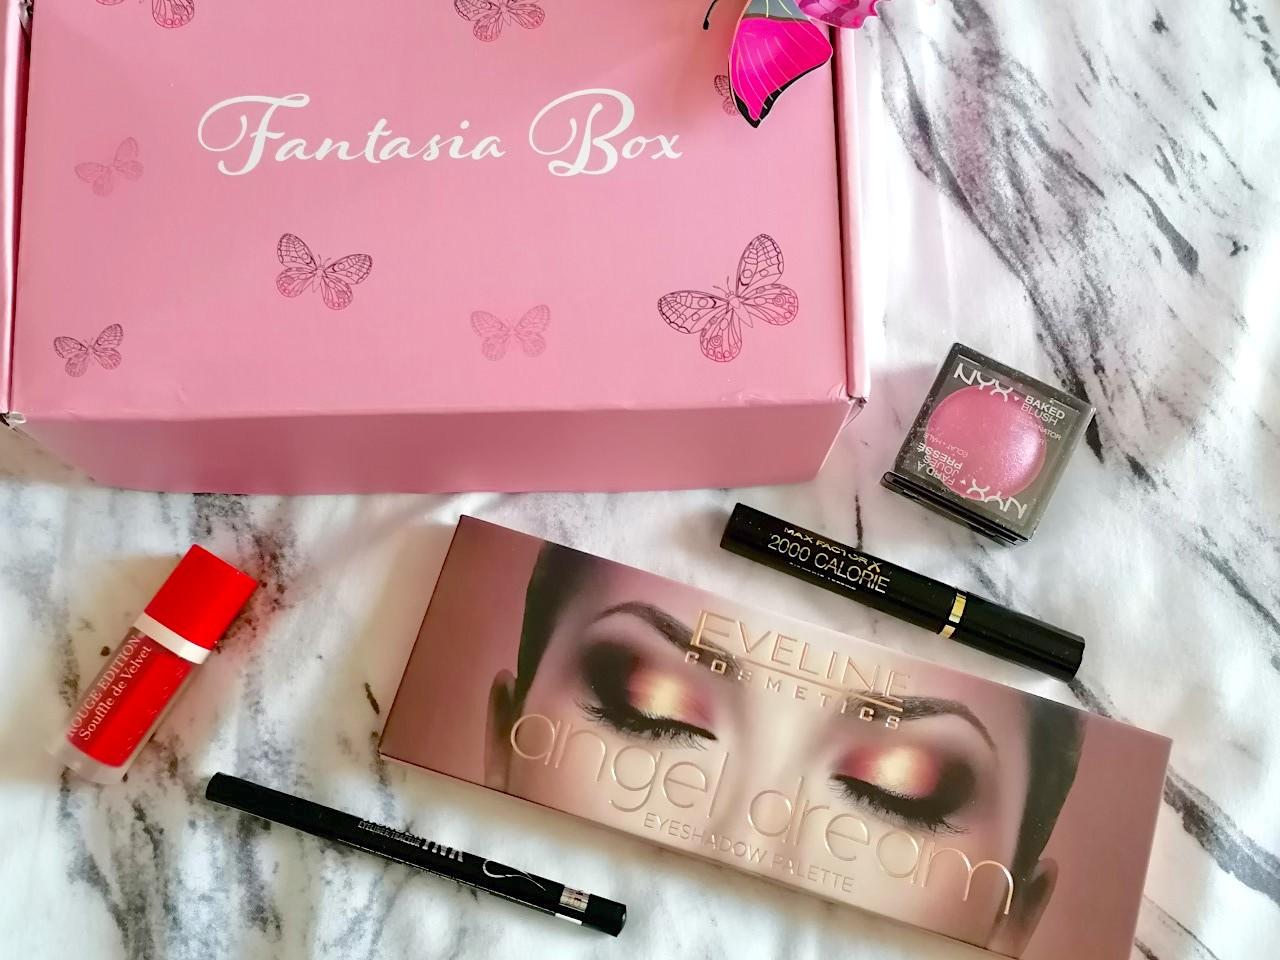 December Fantasia Subscription Box